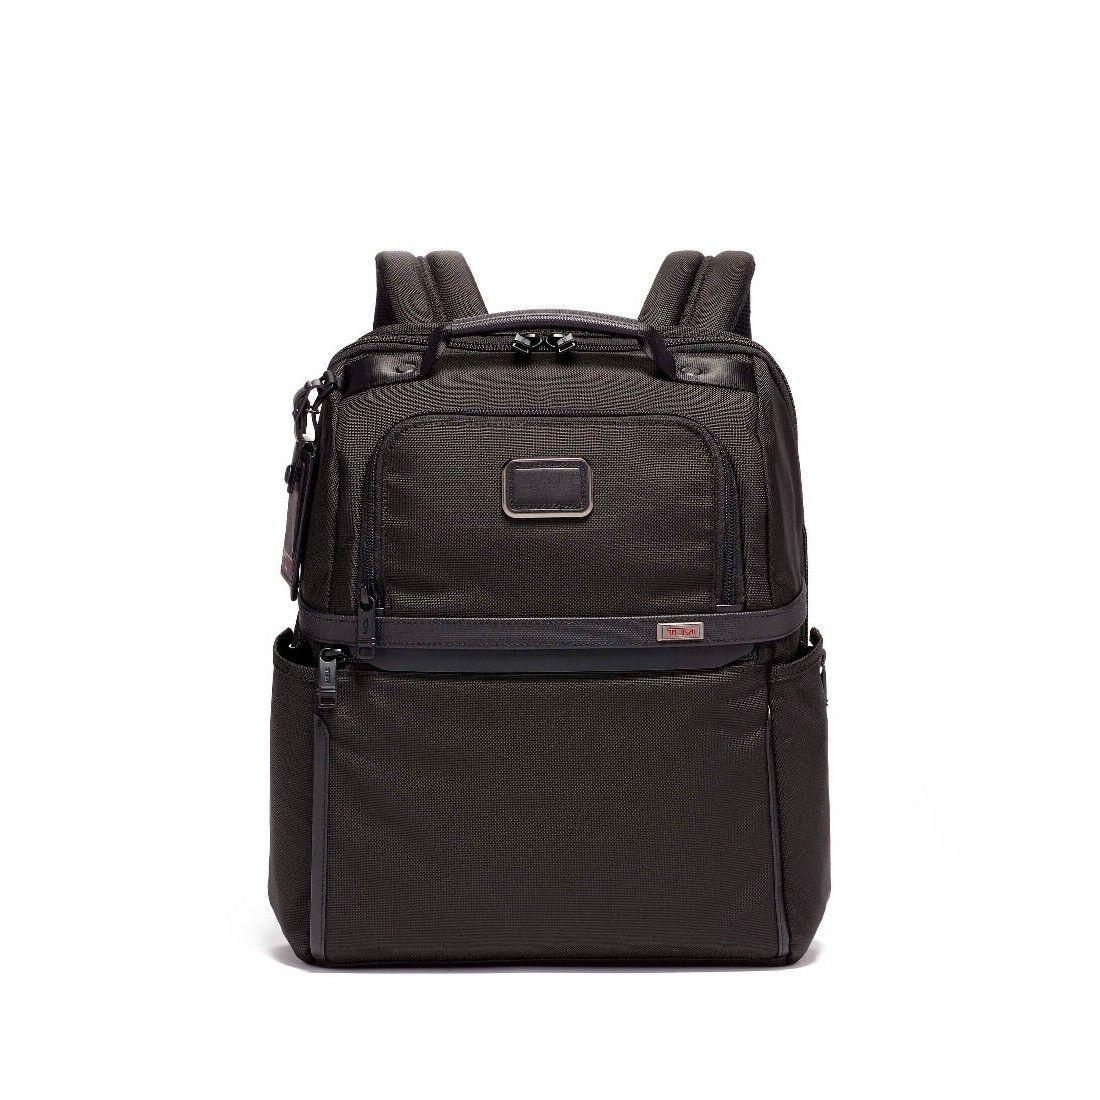 Mochila Slim Solutions Briefpack - Tumi